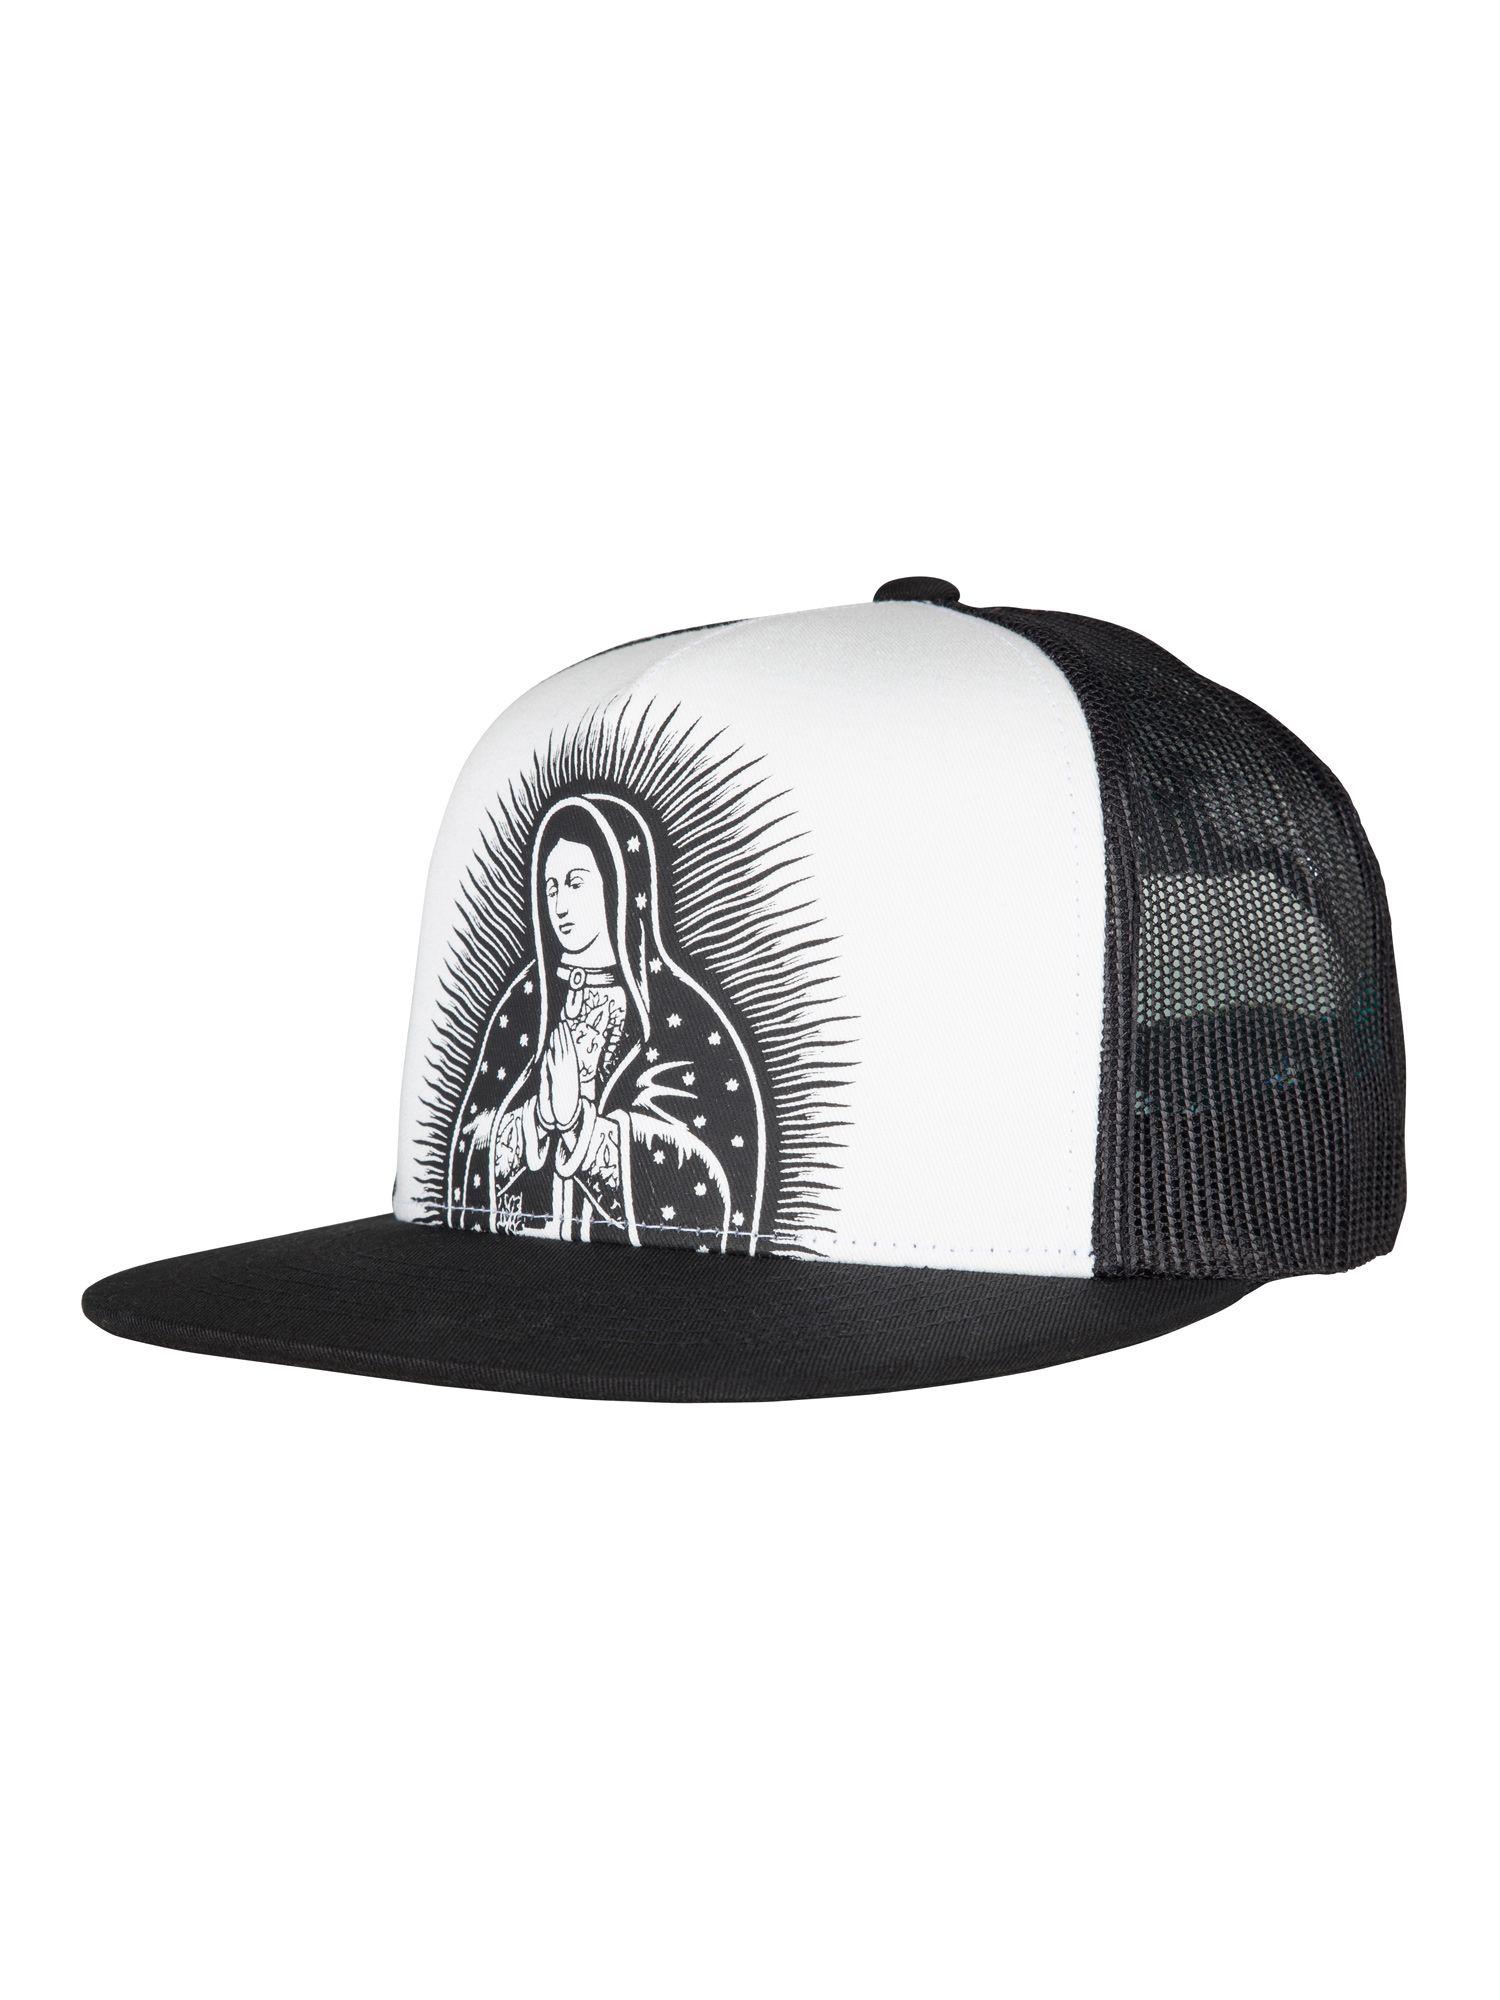 6f69d60d2cd155 Santa Cruz. Guadalupe Mesh Cap. White/Black